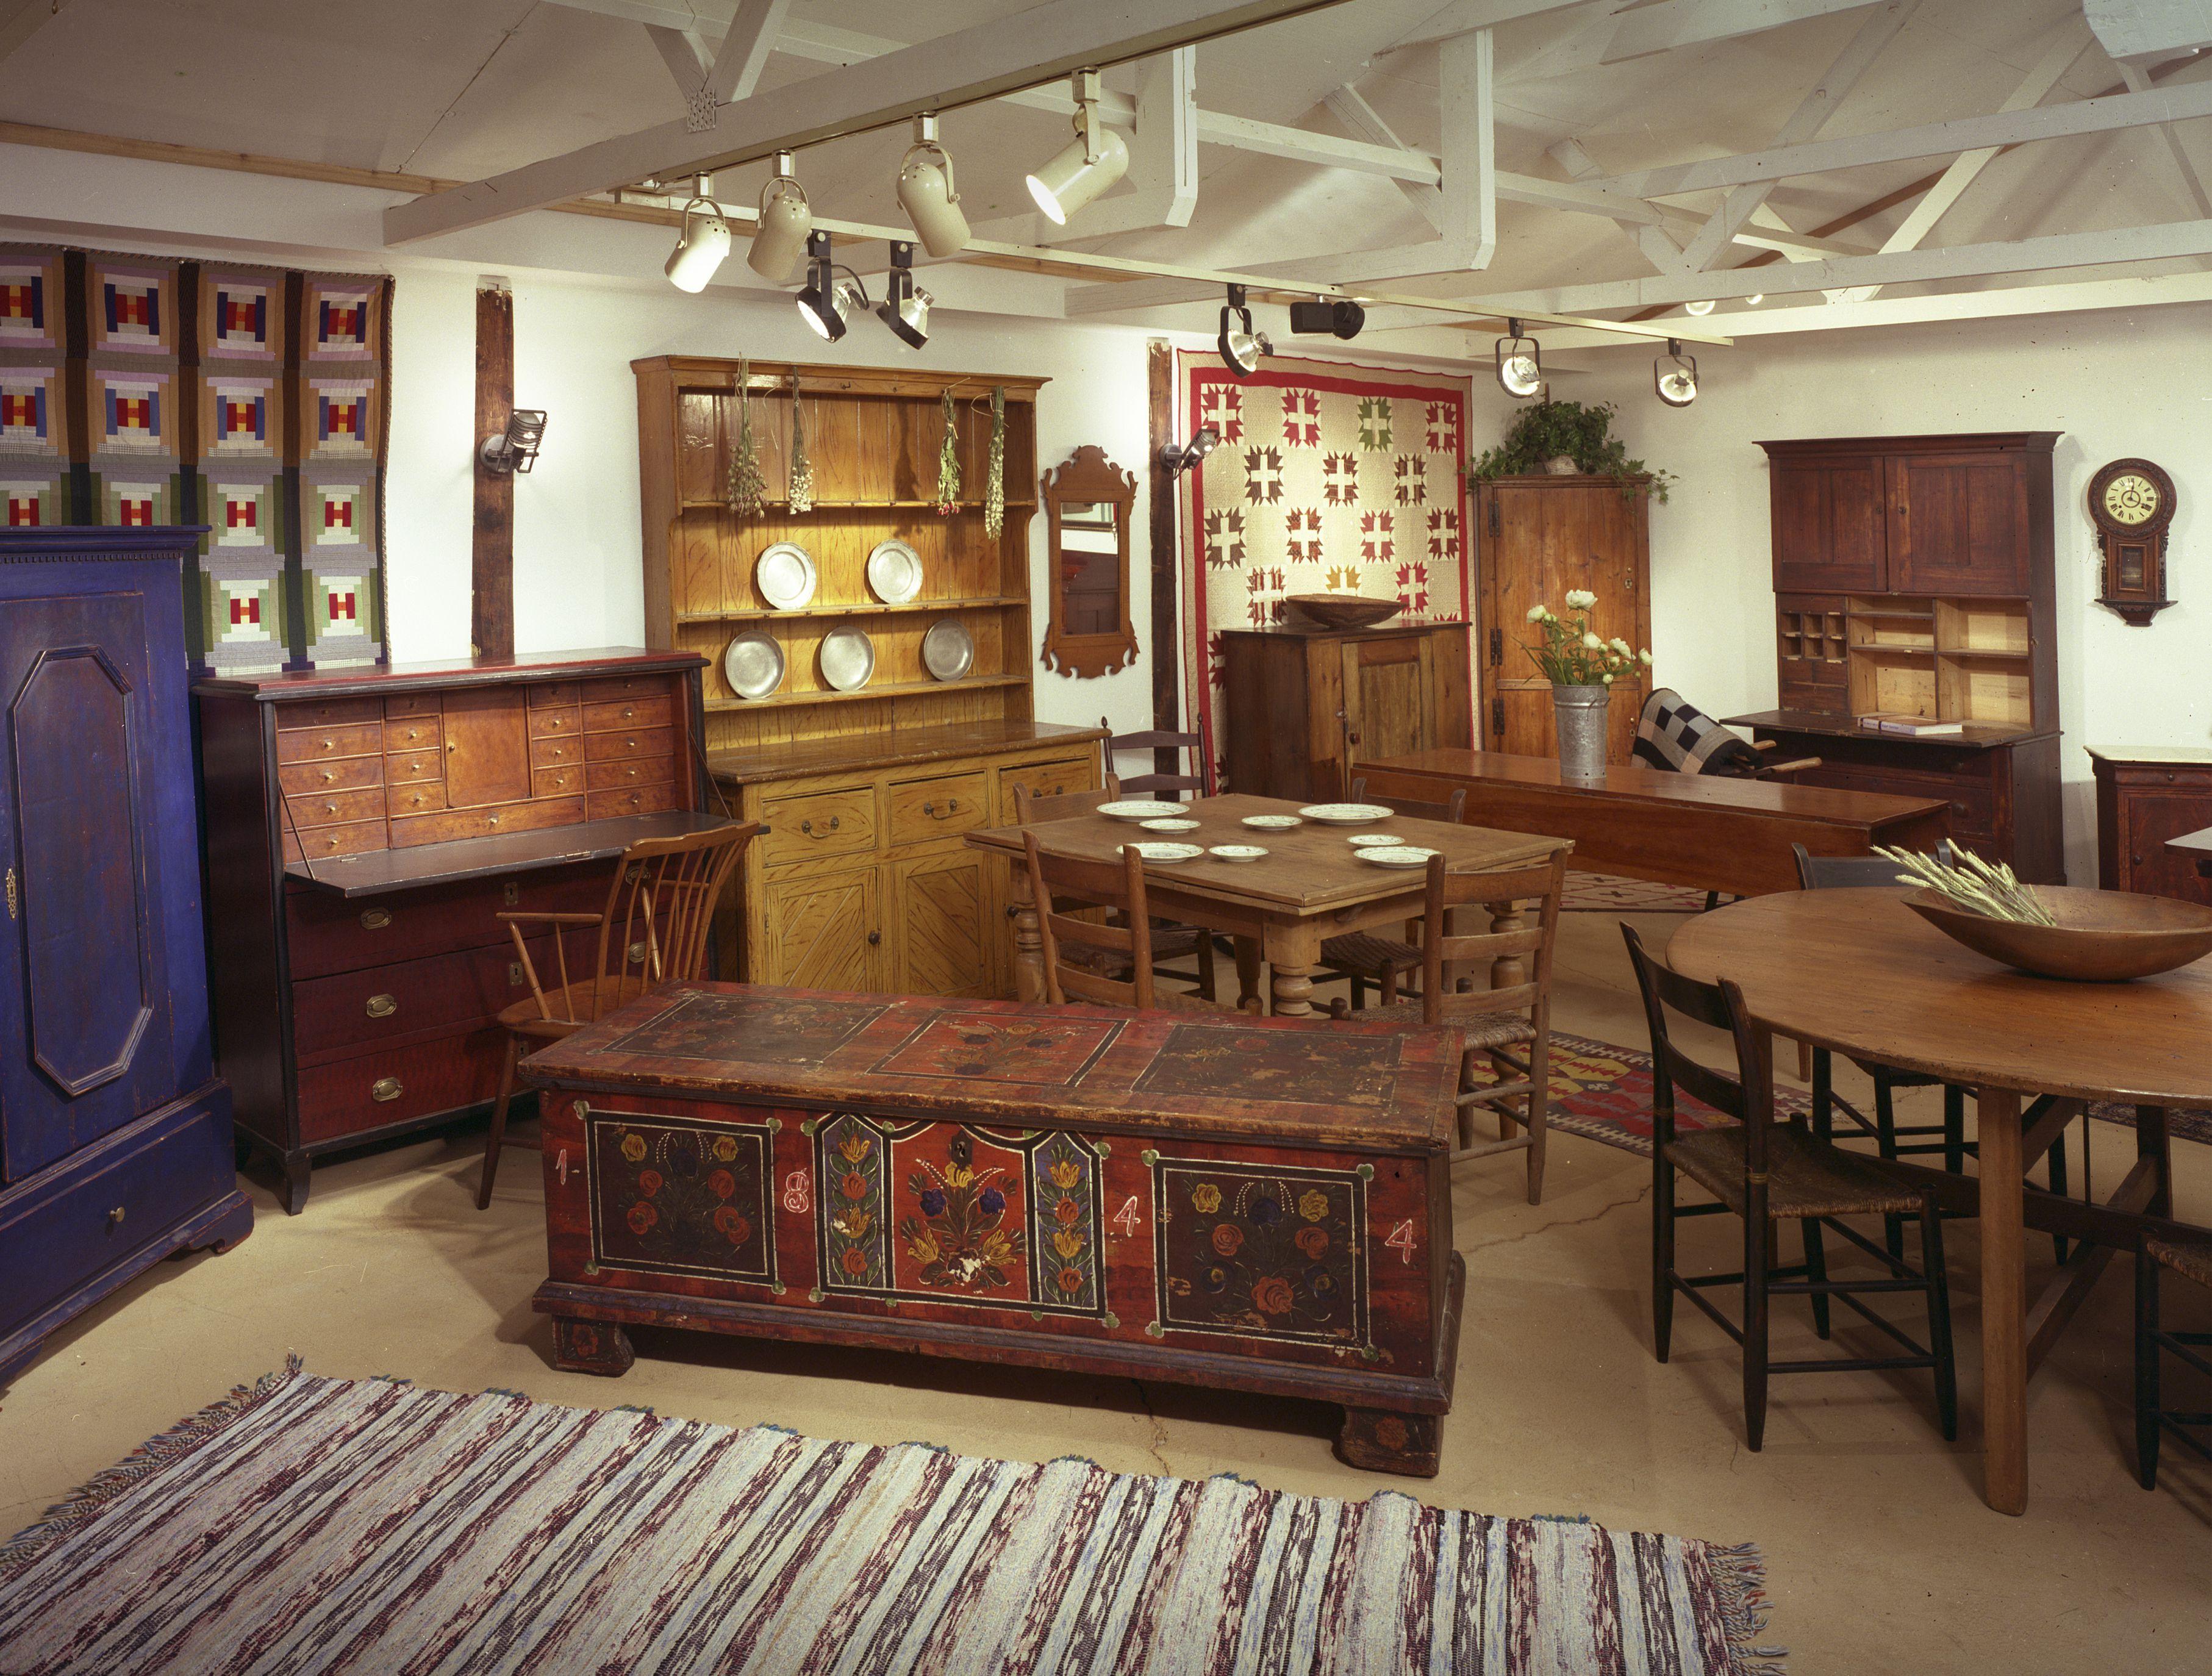 West Howard Antiques & Design District Kensington MD